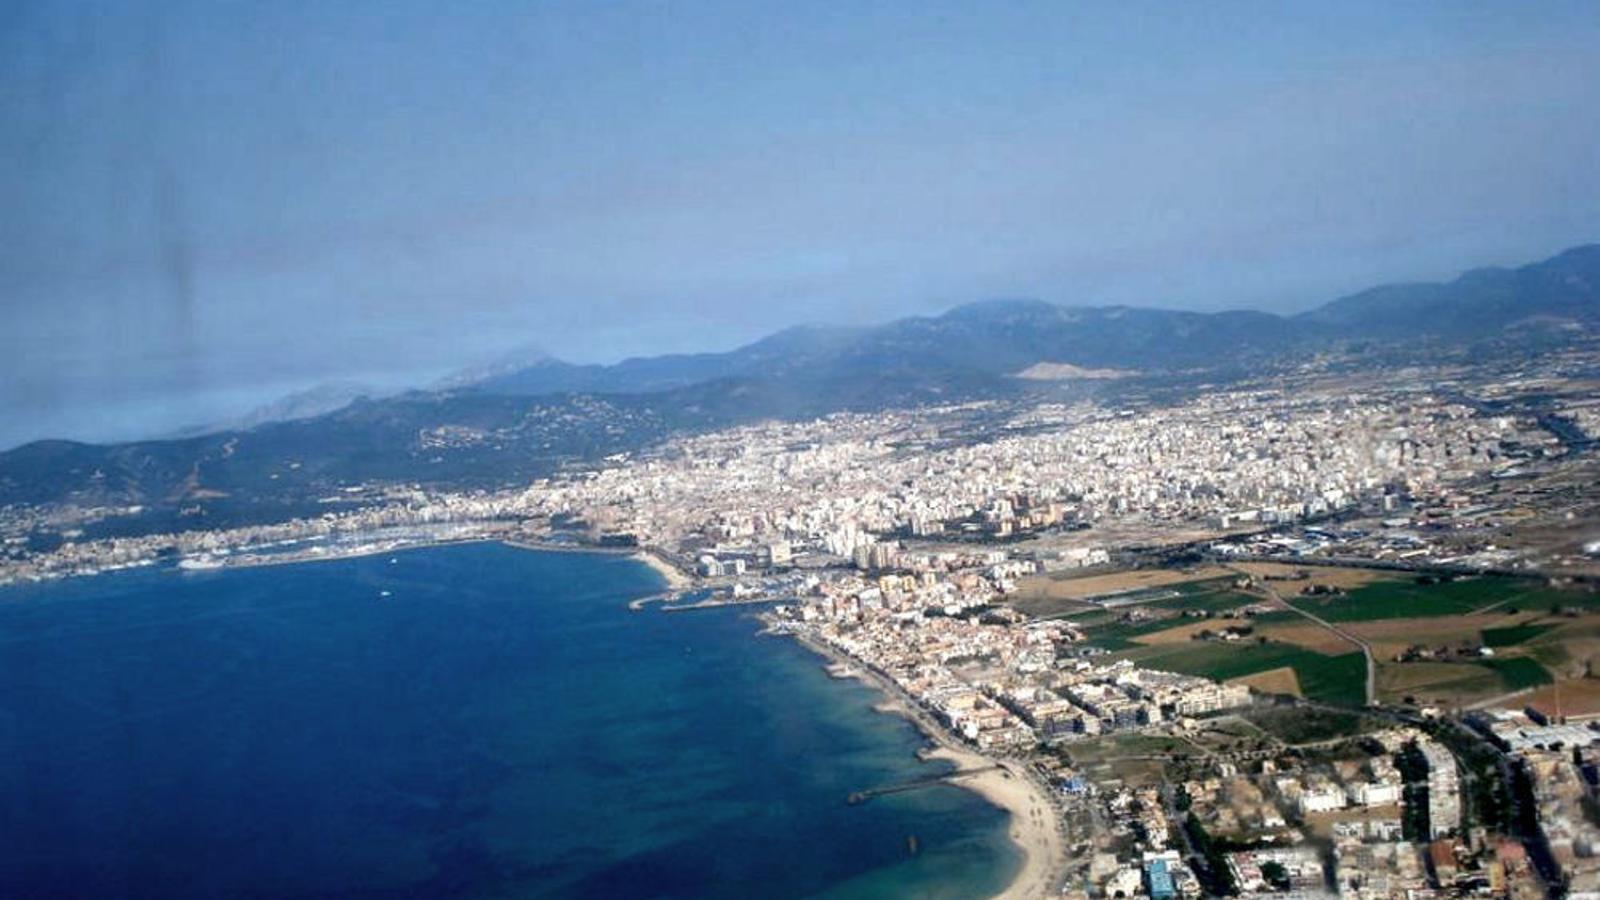 Vista aèria de la badia de Palma